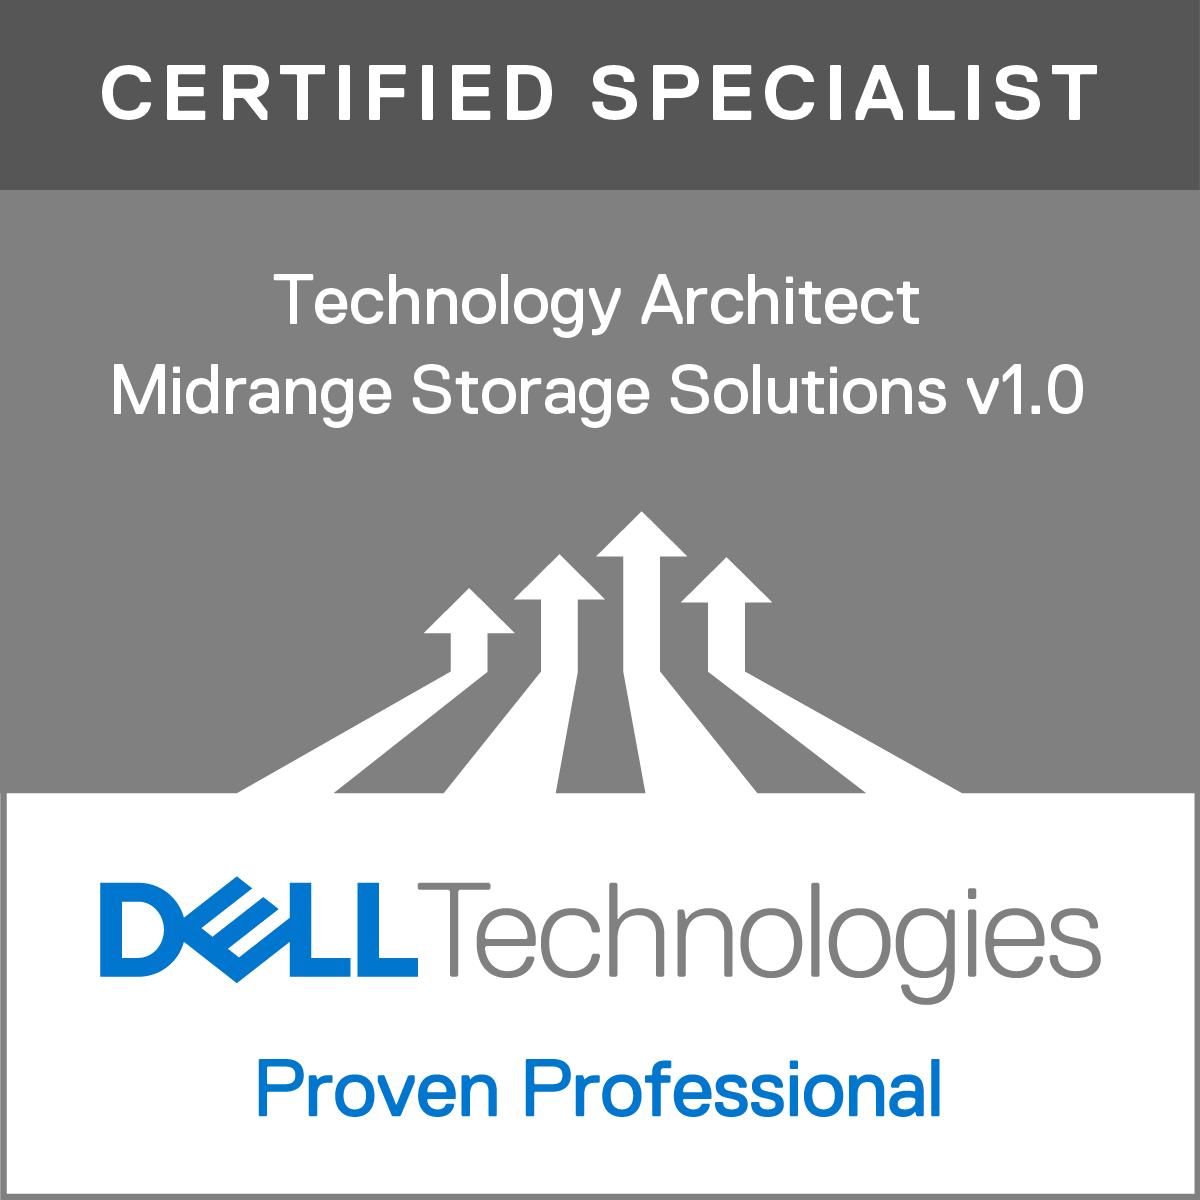 Specialist - Technology Architect, Midrange Storage Solutions Version 1.0